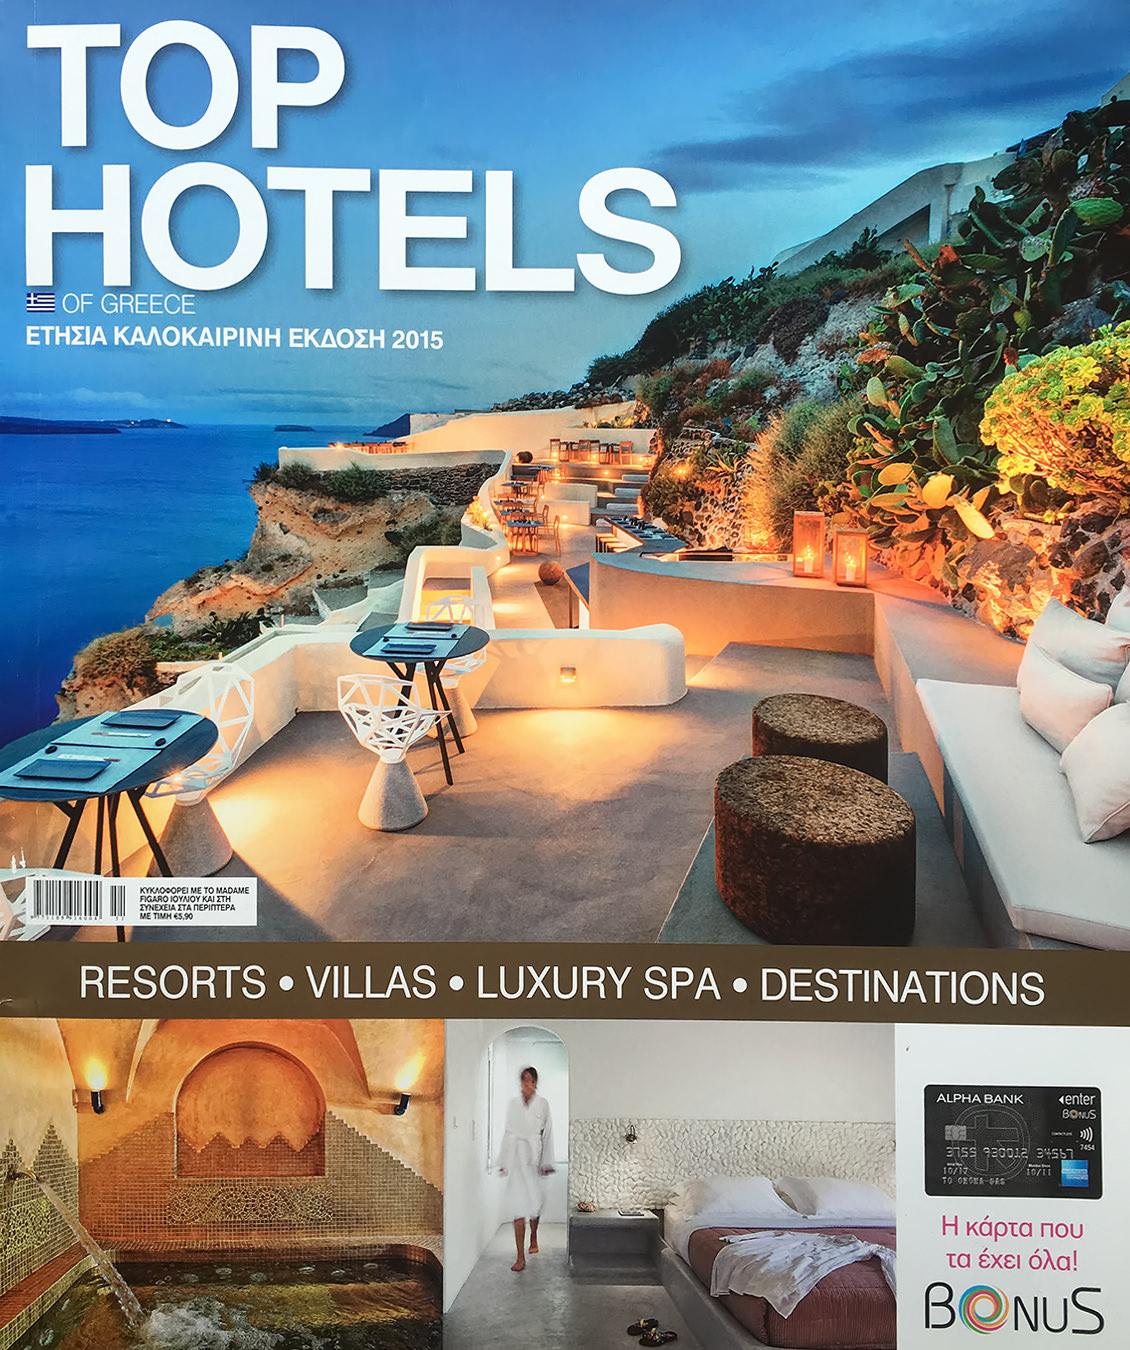 Top Hotels Magazine 2015, Γιώργος Φάκαρος - Αρχιτεκτονική Φωτογραφία | Εσωτερικοί Χώροι | Φωτογραφία Ξενοδοχειών - Photography / Φωτογραφία